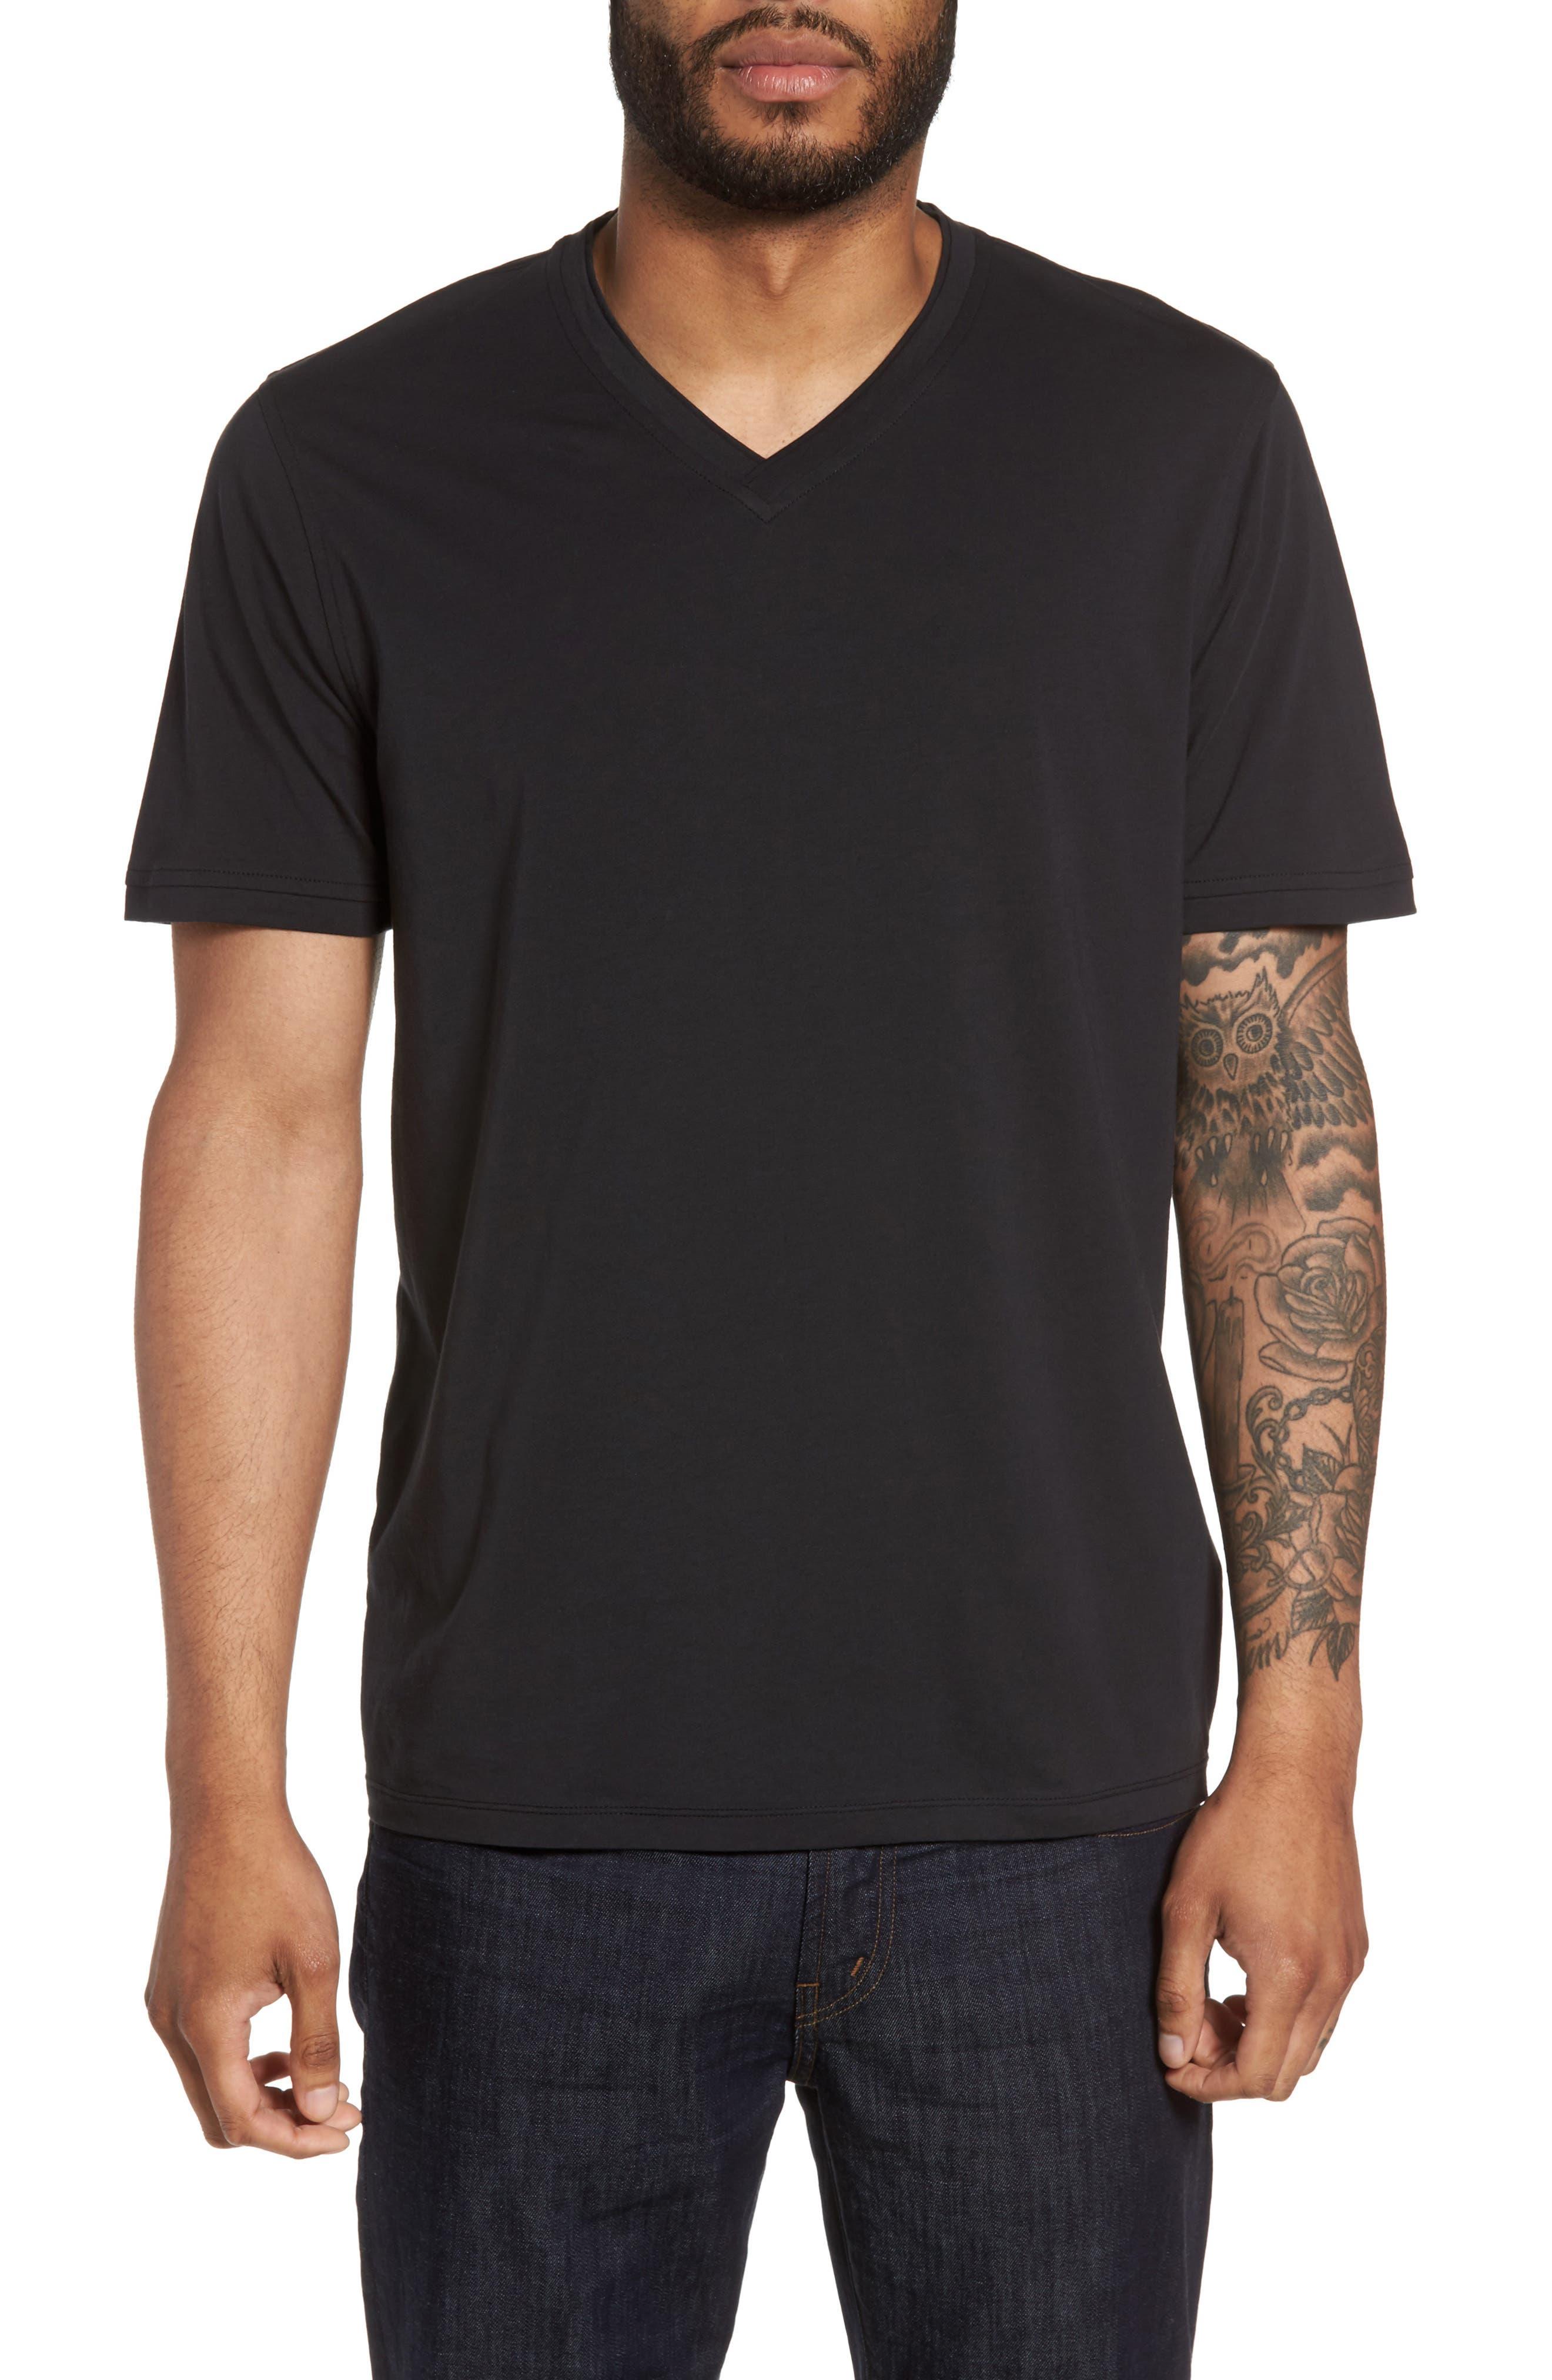 Calibrate Trim Fit V-Neck T-Shirt